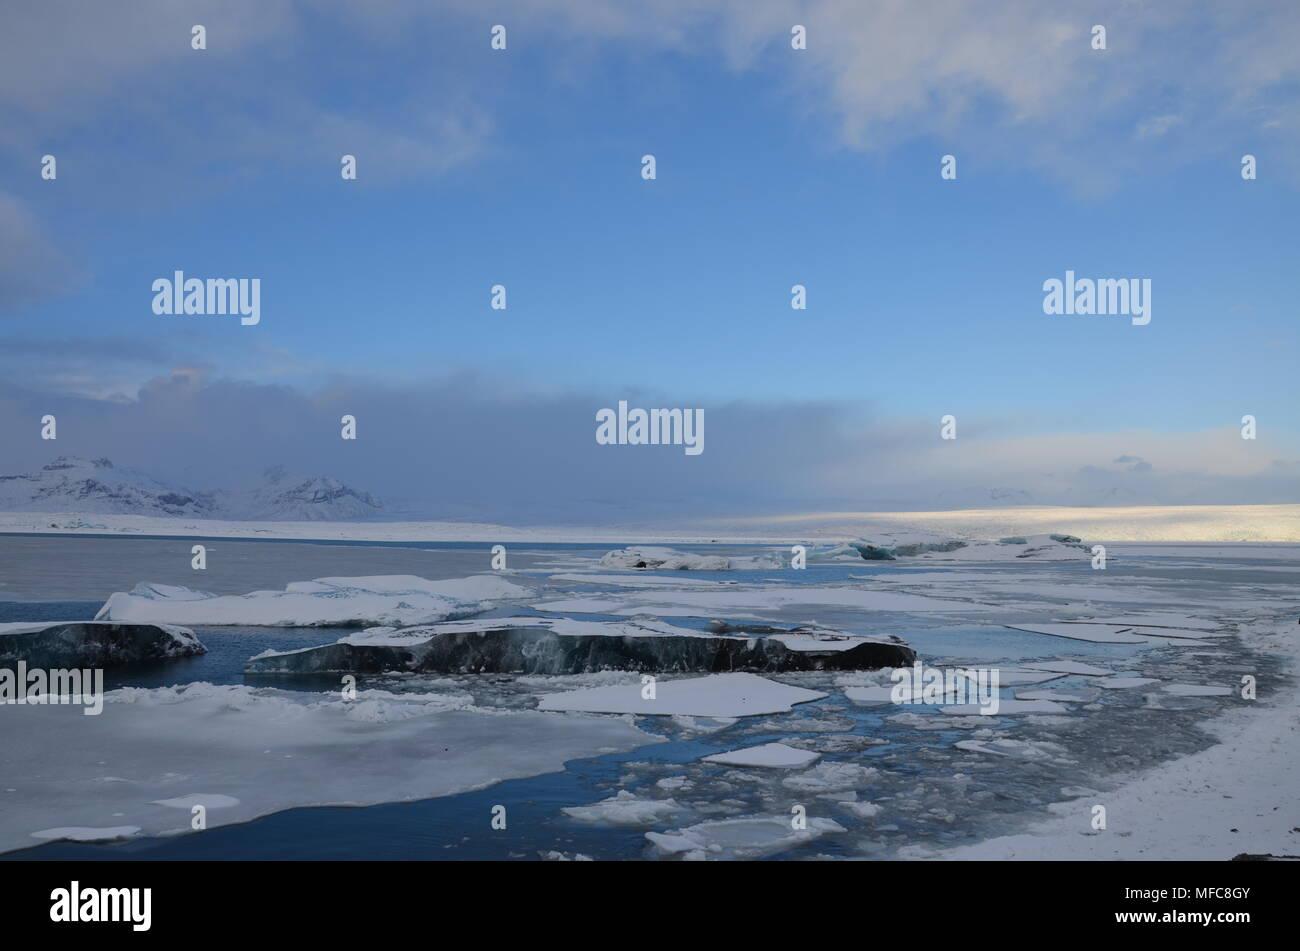 Þjóðvegur Iceland Immagini e Fotos Stock Alamy